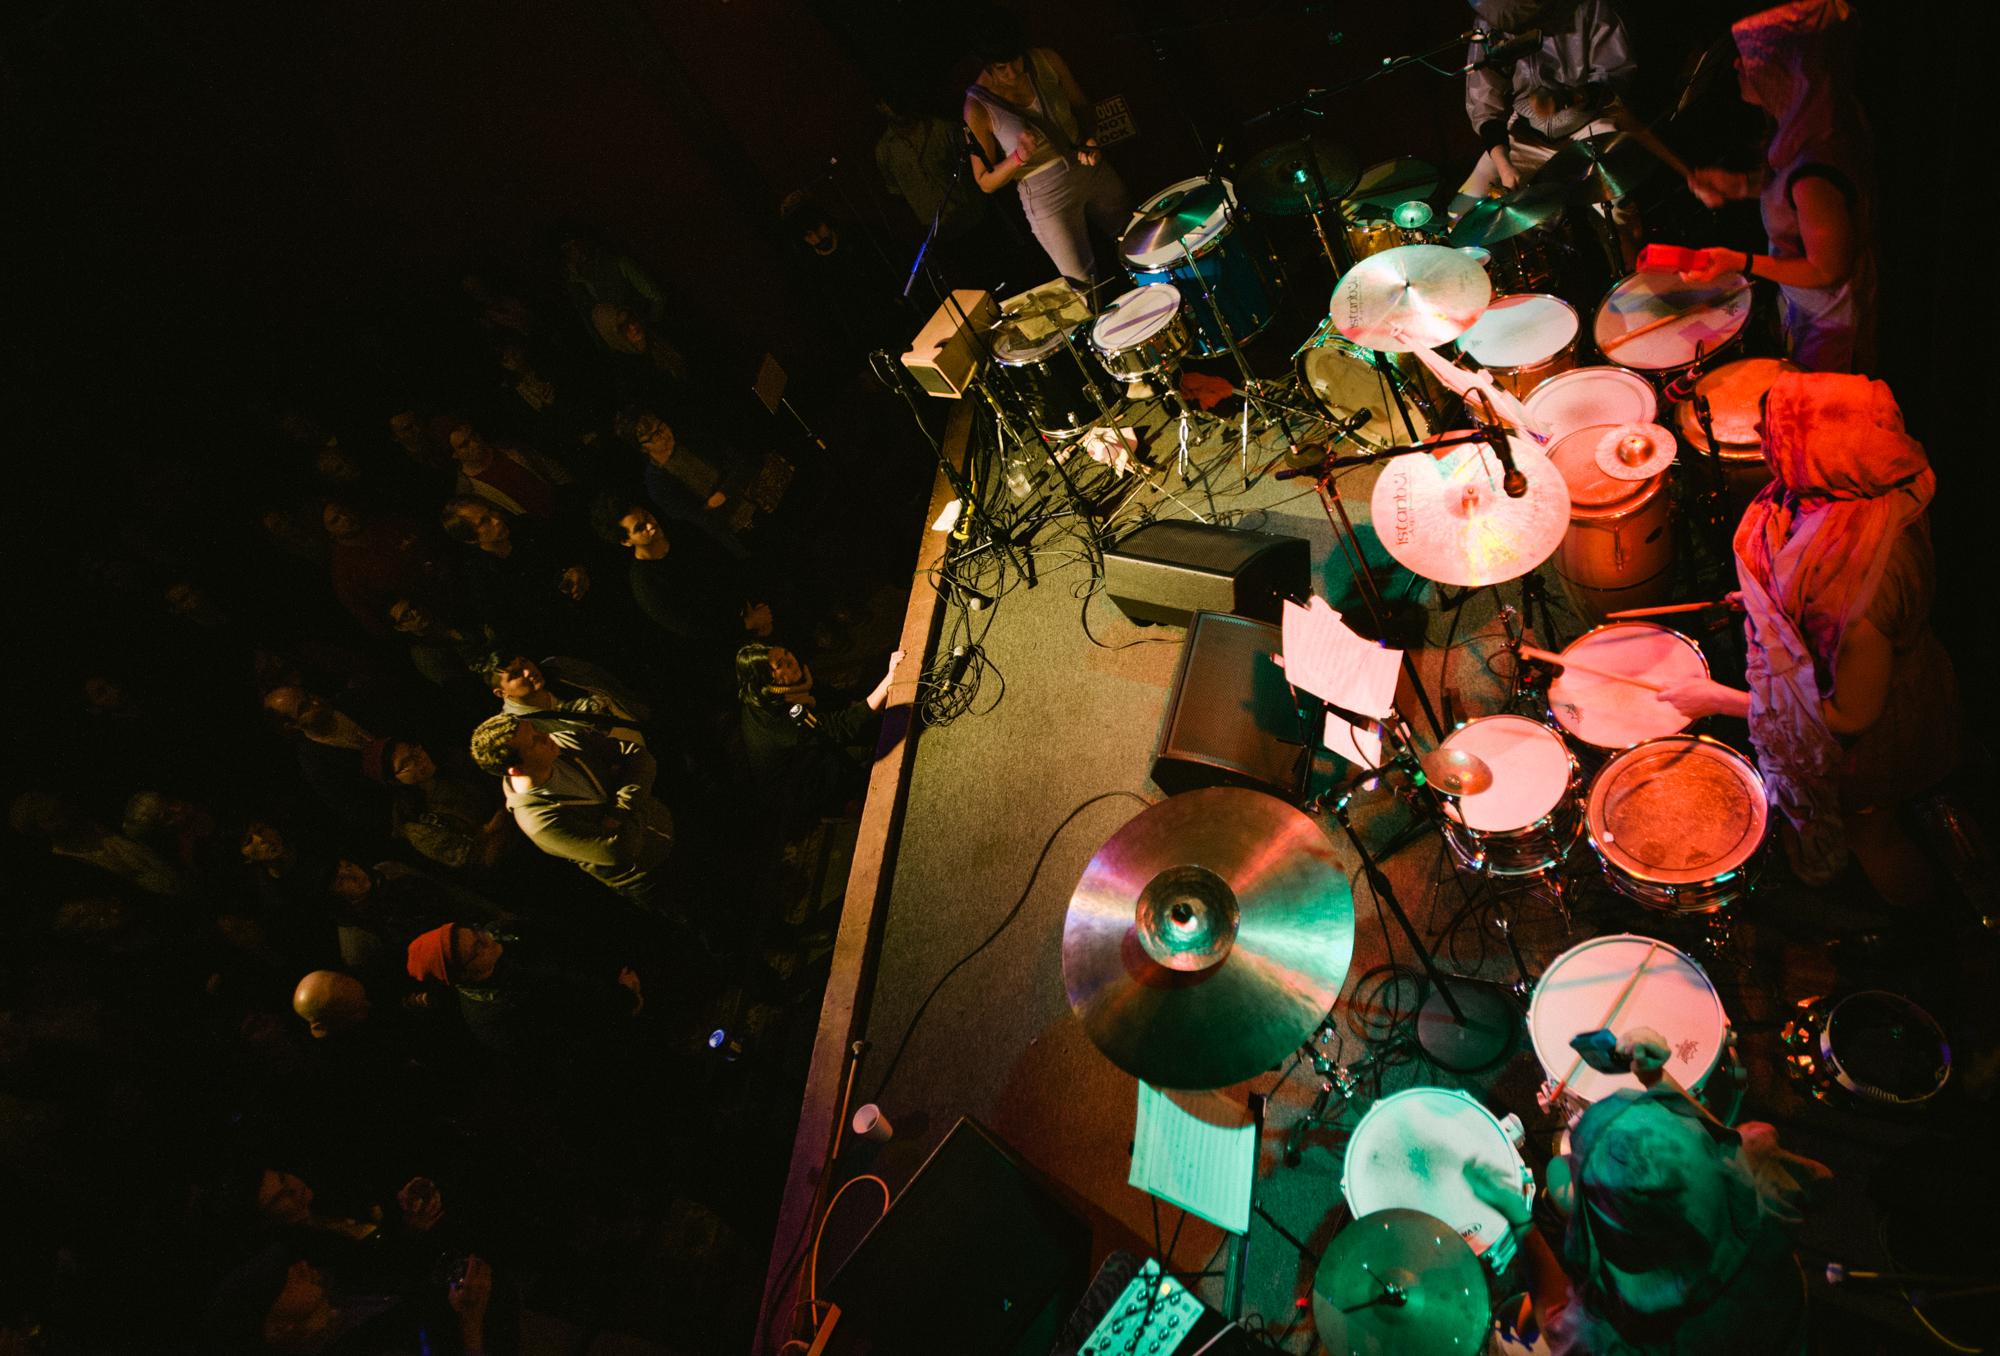 Secret Drum Band at Mississippi Studios, Portland. photo: MARTIN EVANS